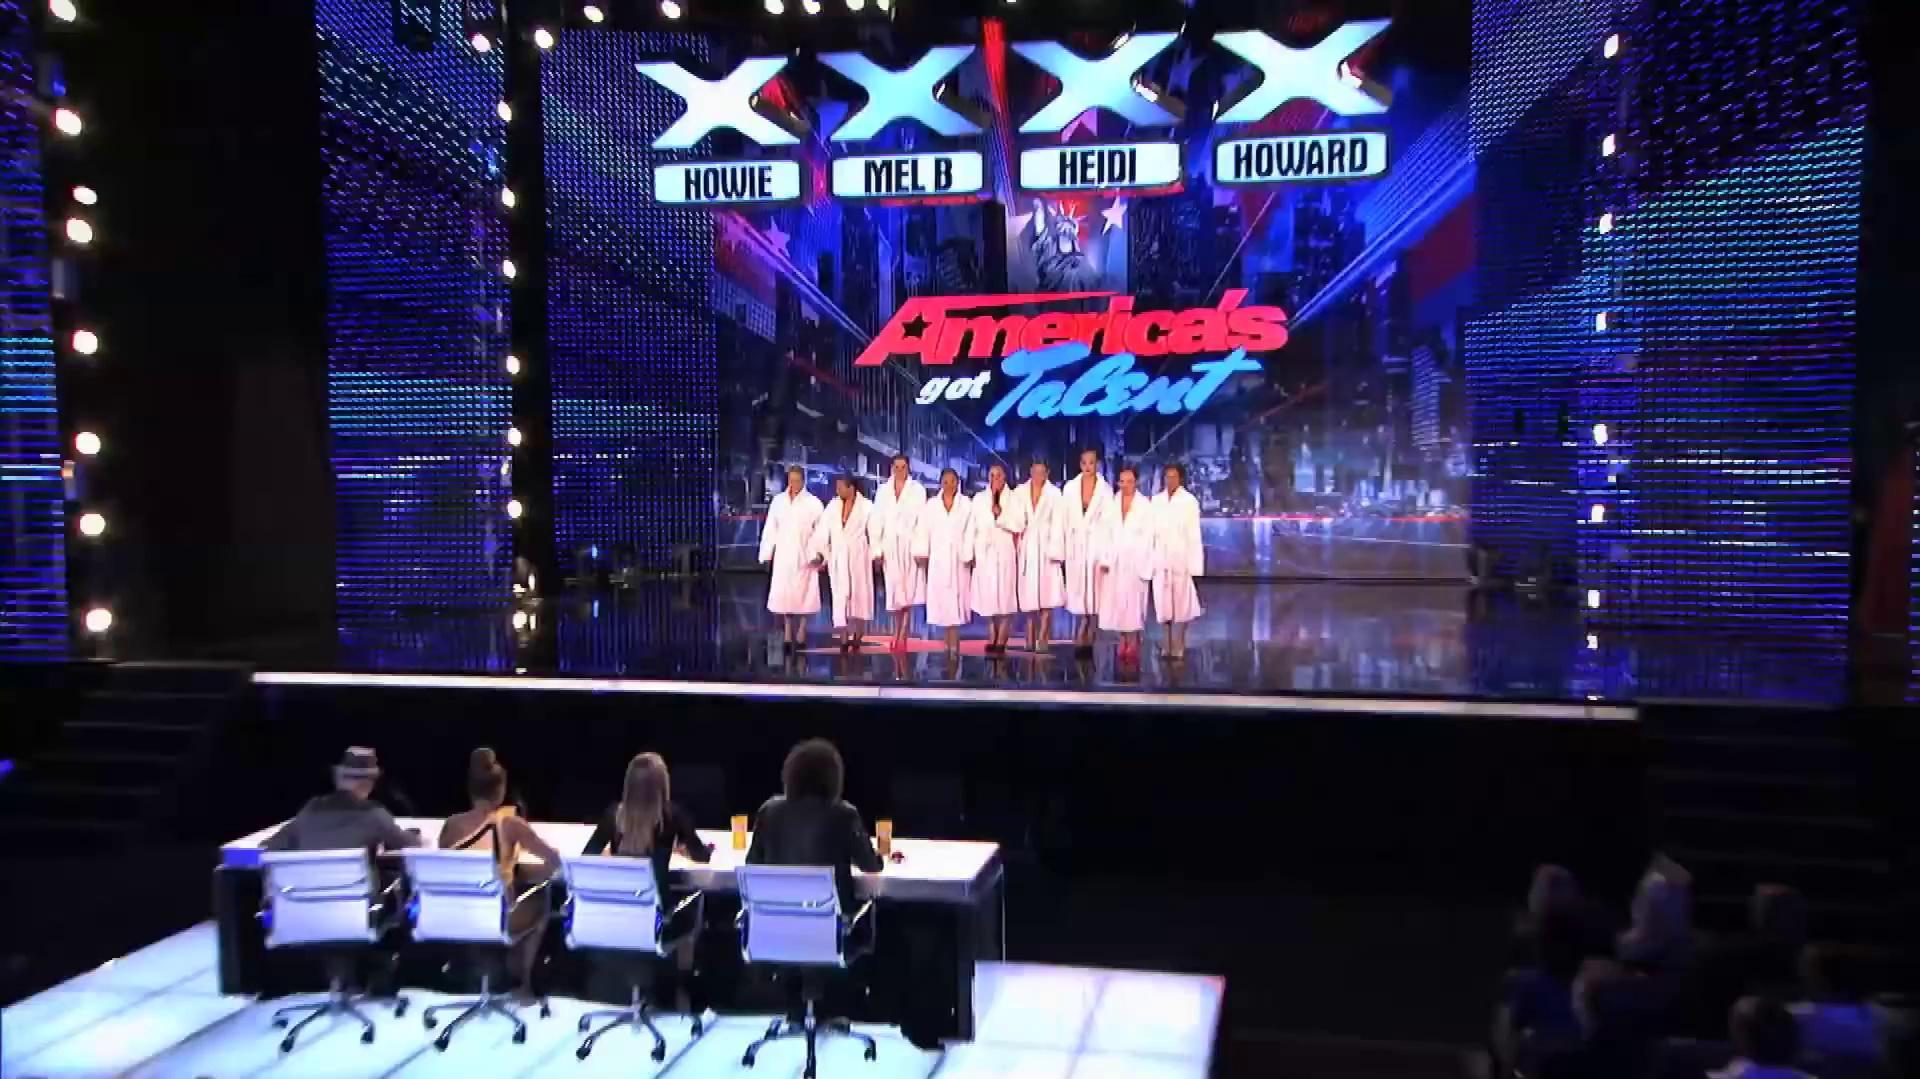 America's Got Talent 2013 - Season 8 - 094 - The Aquanuts - Synchronized Swimming In High Heels